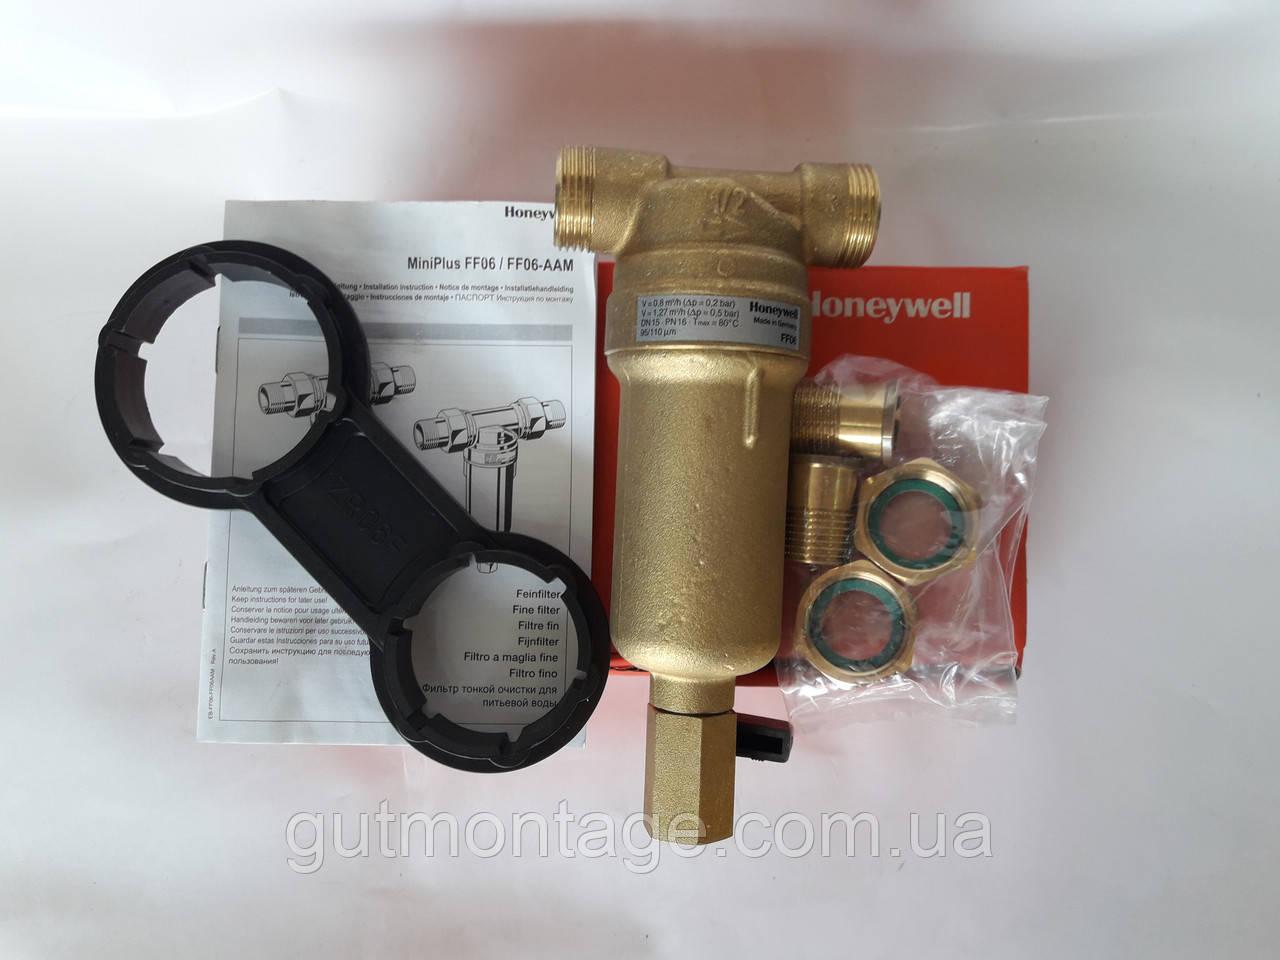 Фильтр 100микрон Honeywell FF06 11/4AAМ. Для частного дома